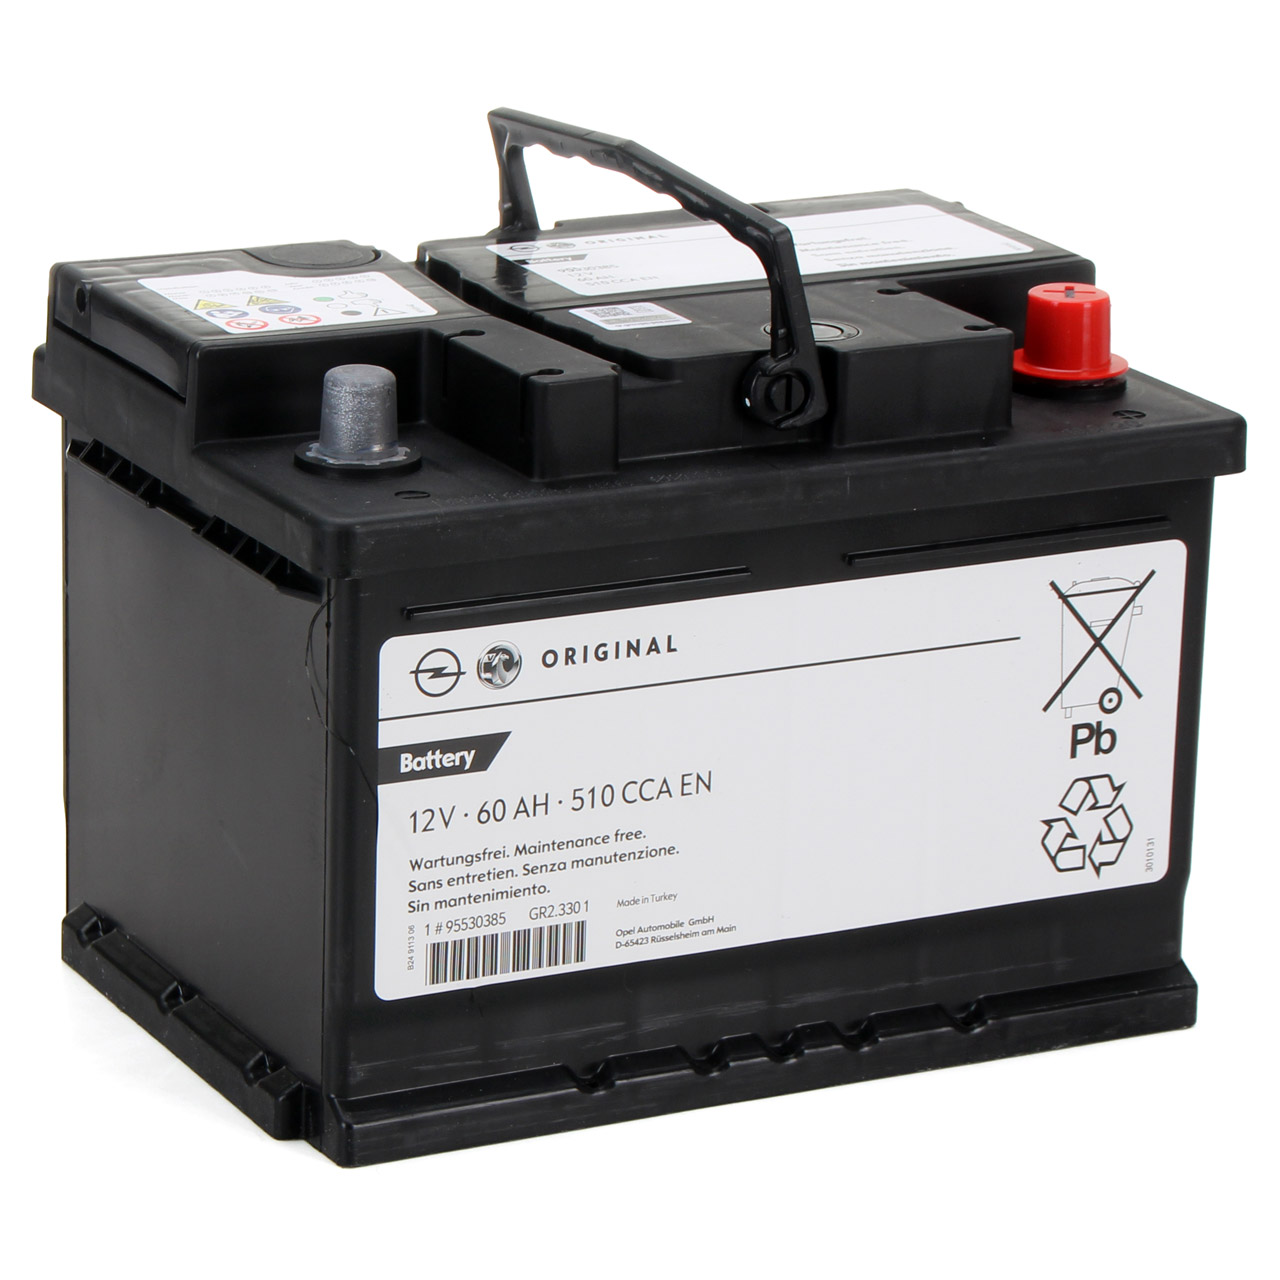 ORIGINAL GM Opel Autobatterie Starterbatterie 12V 60Ah 510A 95523432